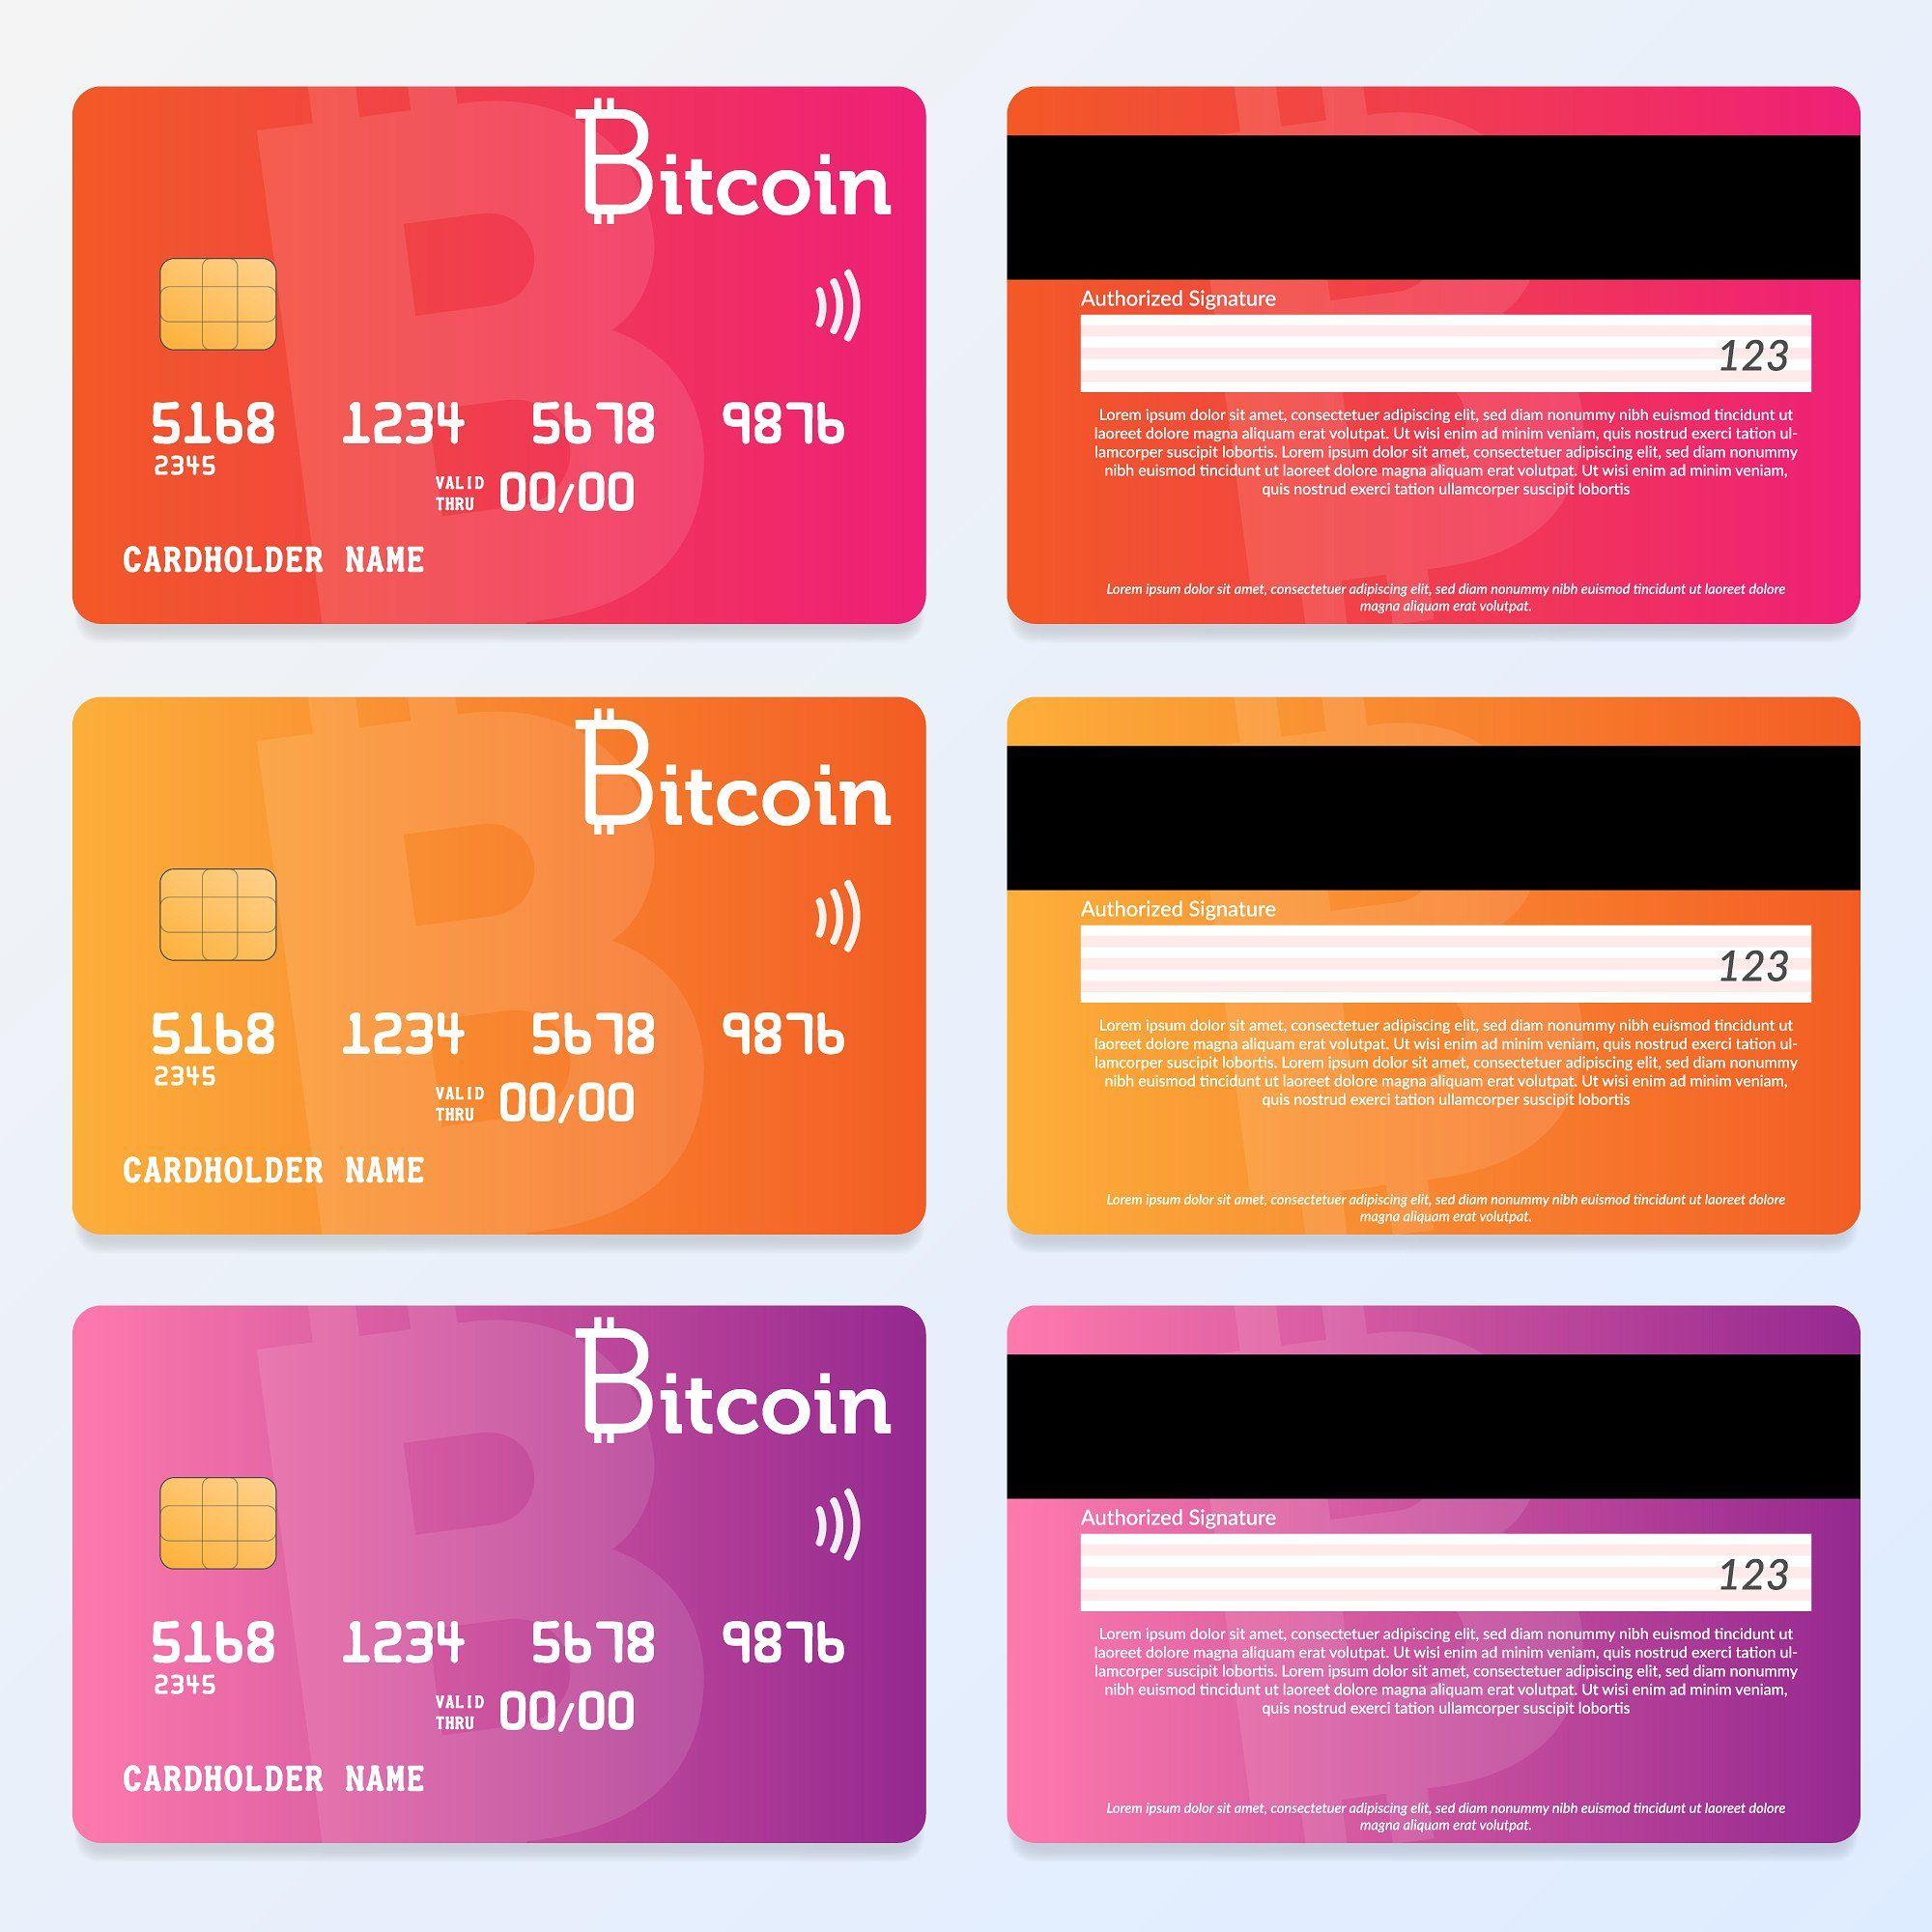 Credit Card Design Bitcoin Pay Credit Card Design Kids Credit Card Debit Card Design